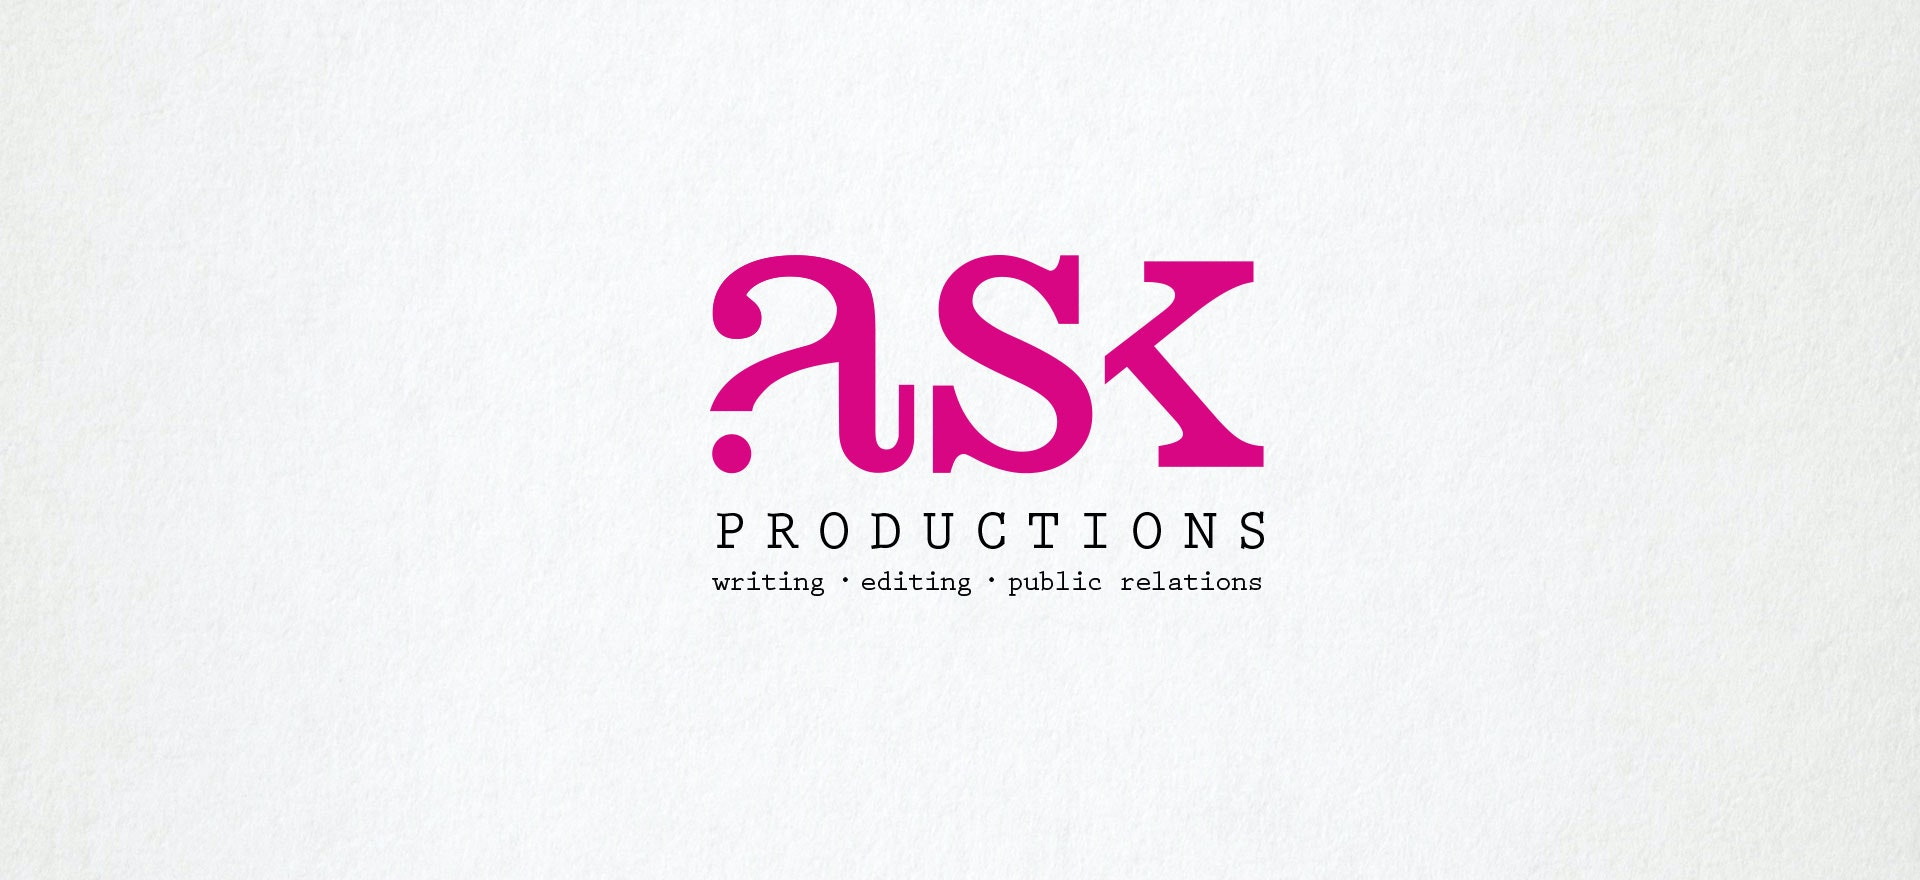 3 ask logo